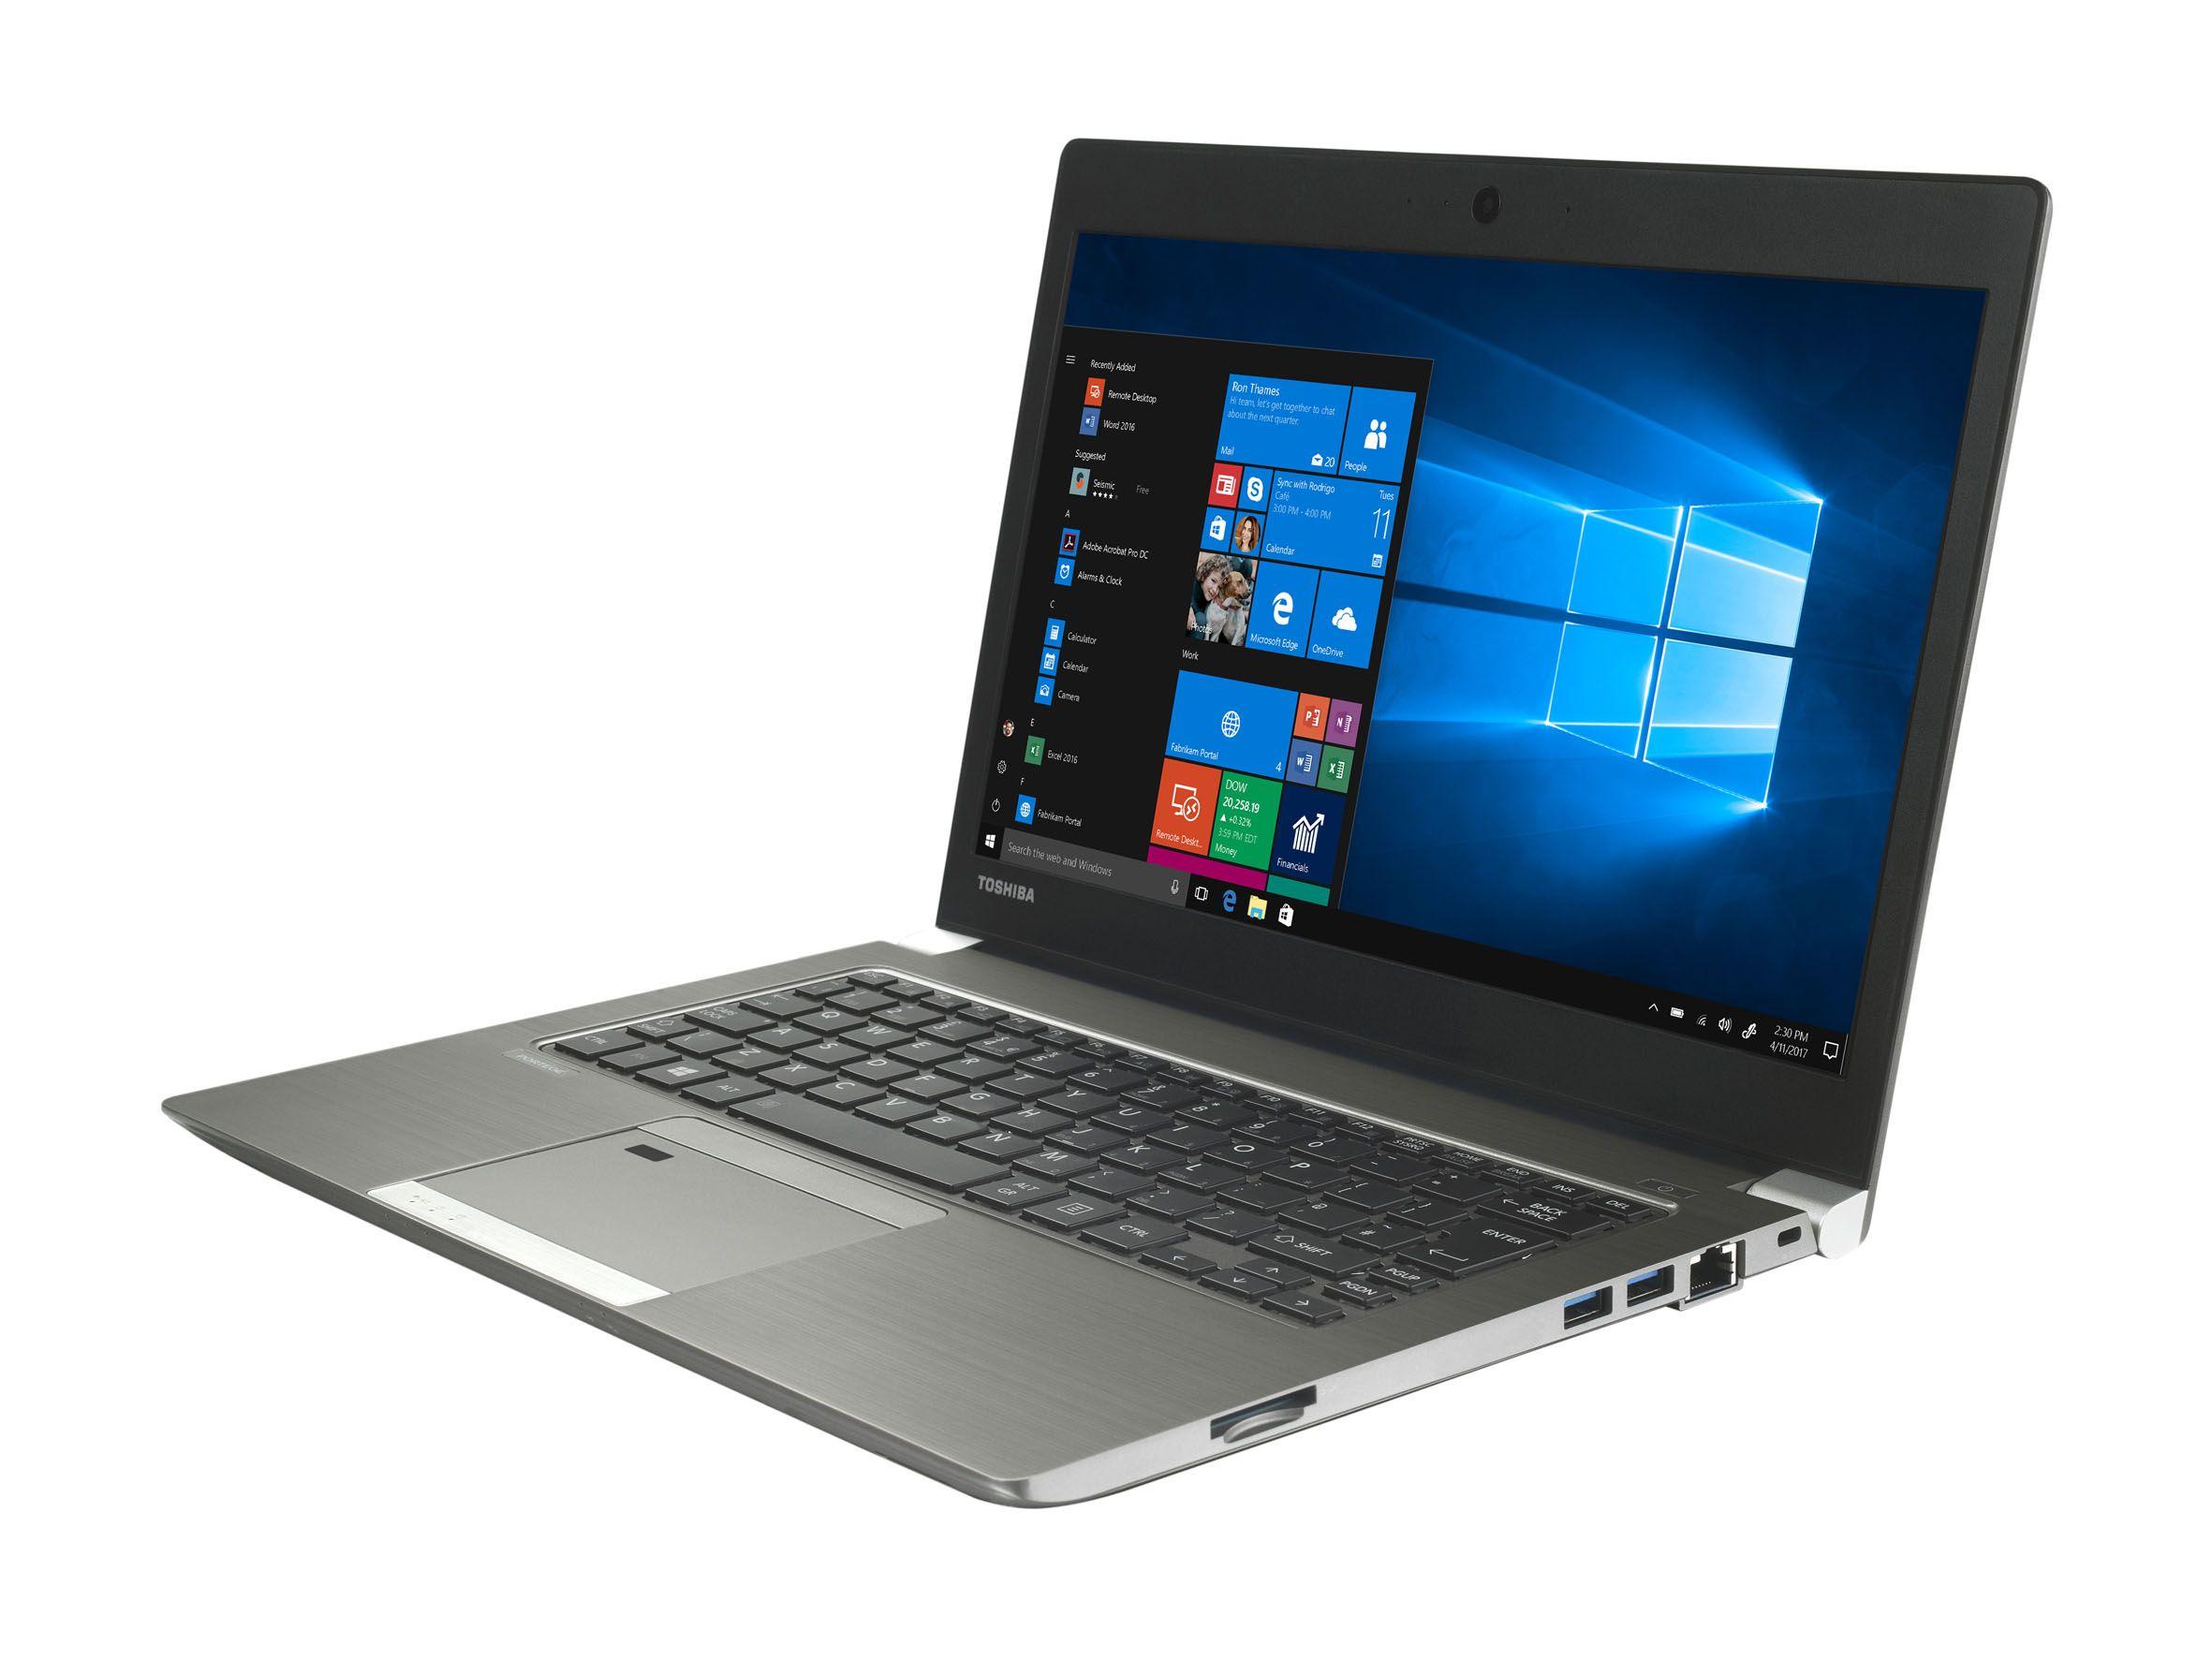 Notebook Toshiba Professional Device Pinterest Dell Inspiron 15 7567 I5 7300hq 4gb Ddr4 Gtx 1050 Ti Win10 Black